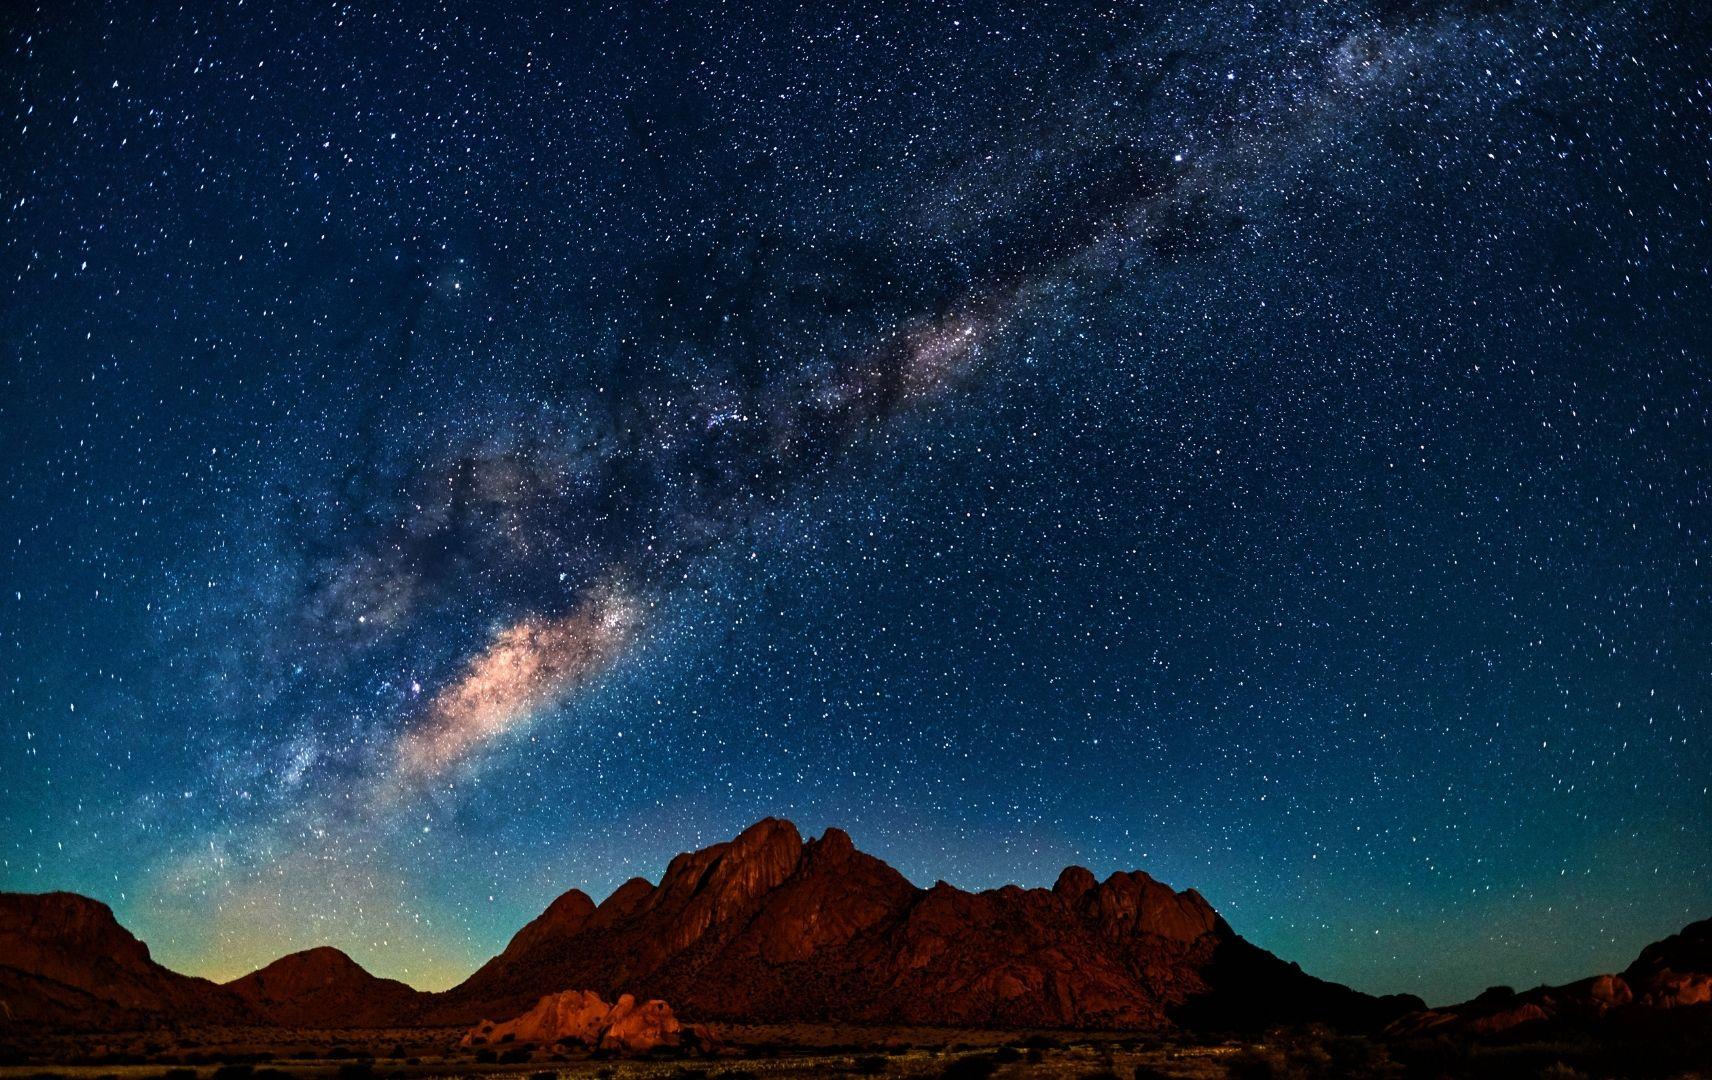 Milchstraße über Namibia